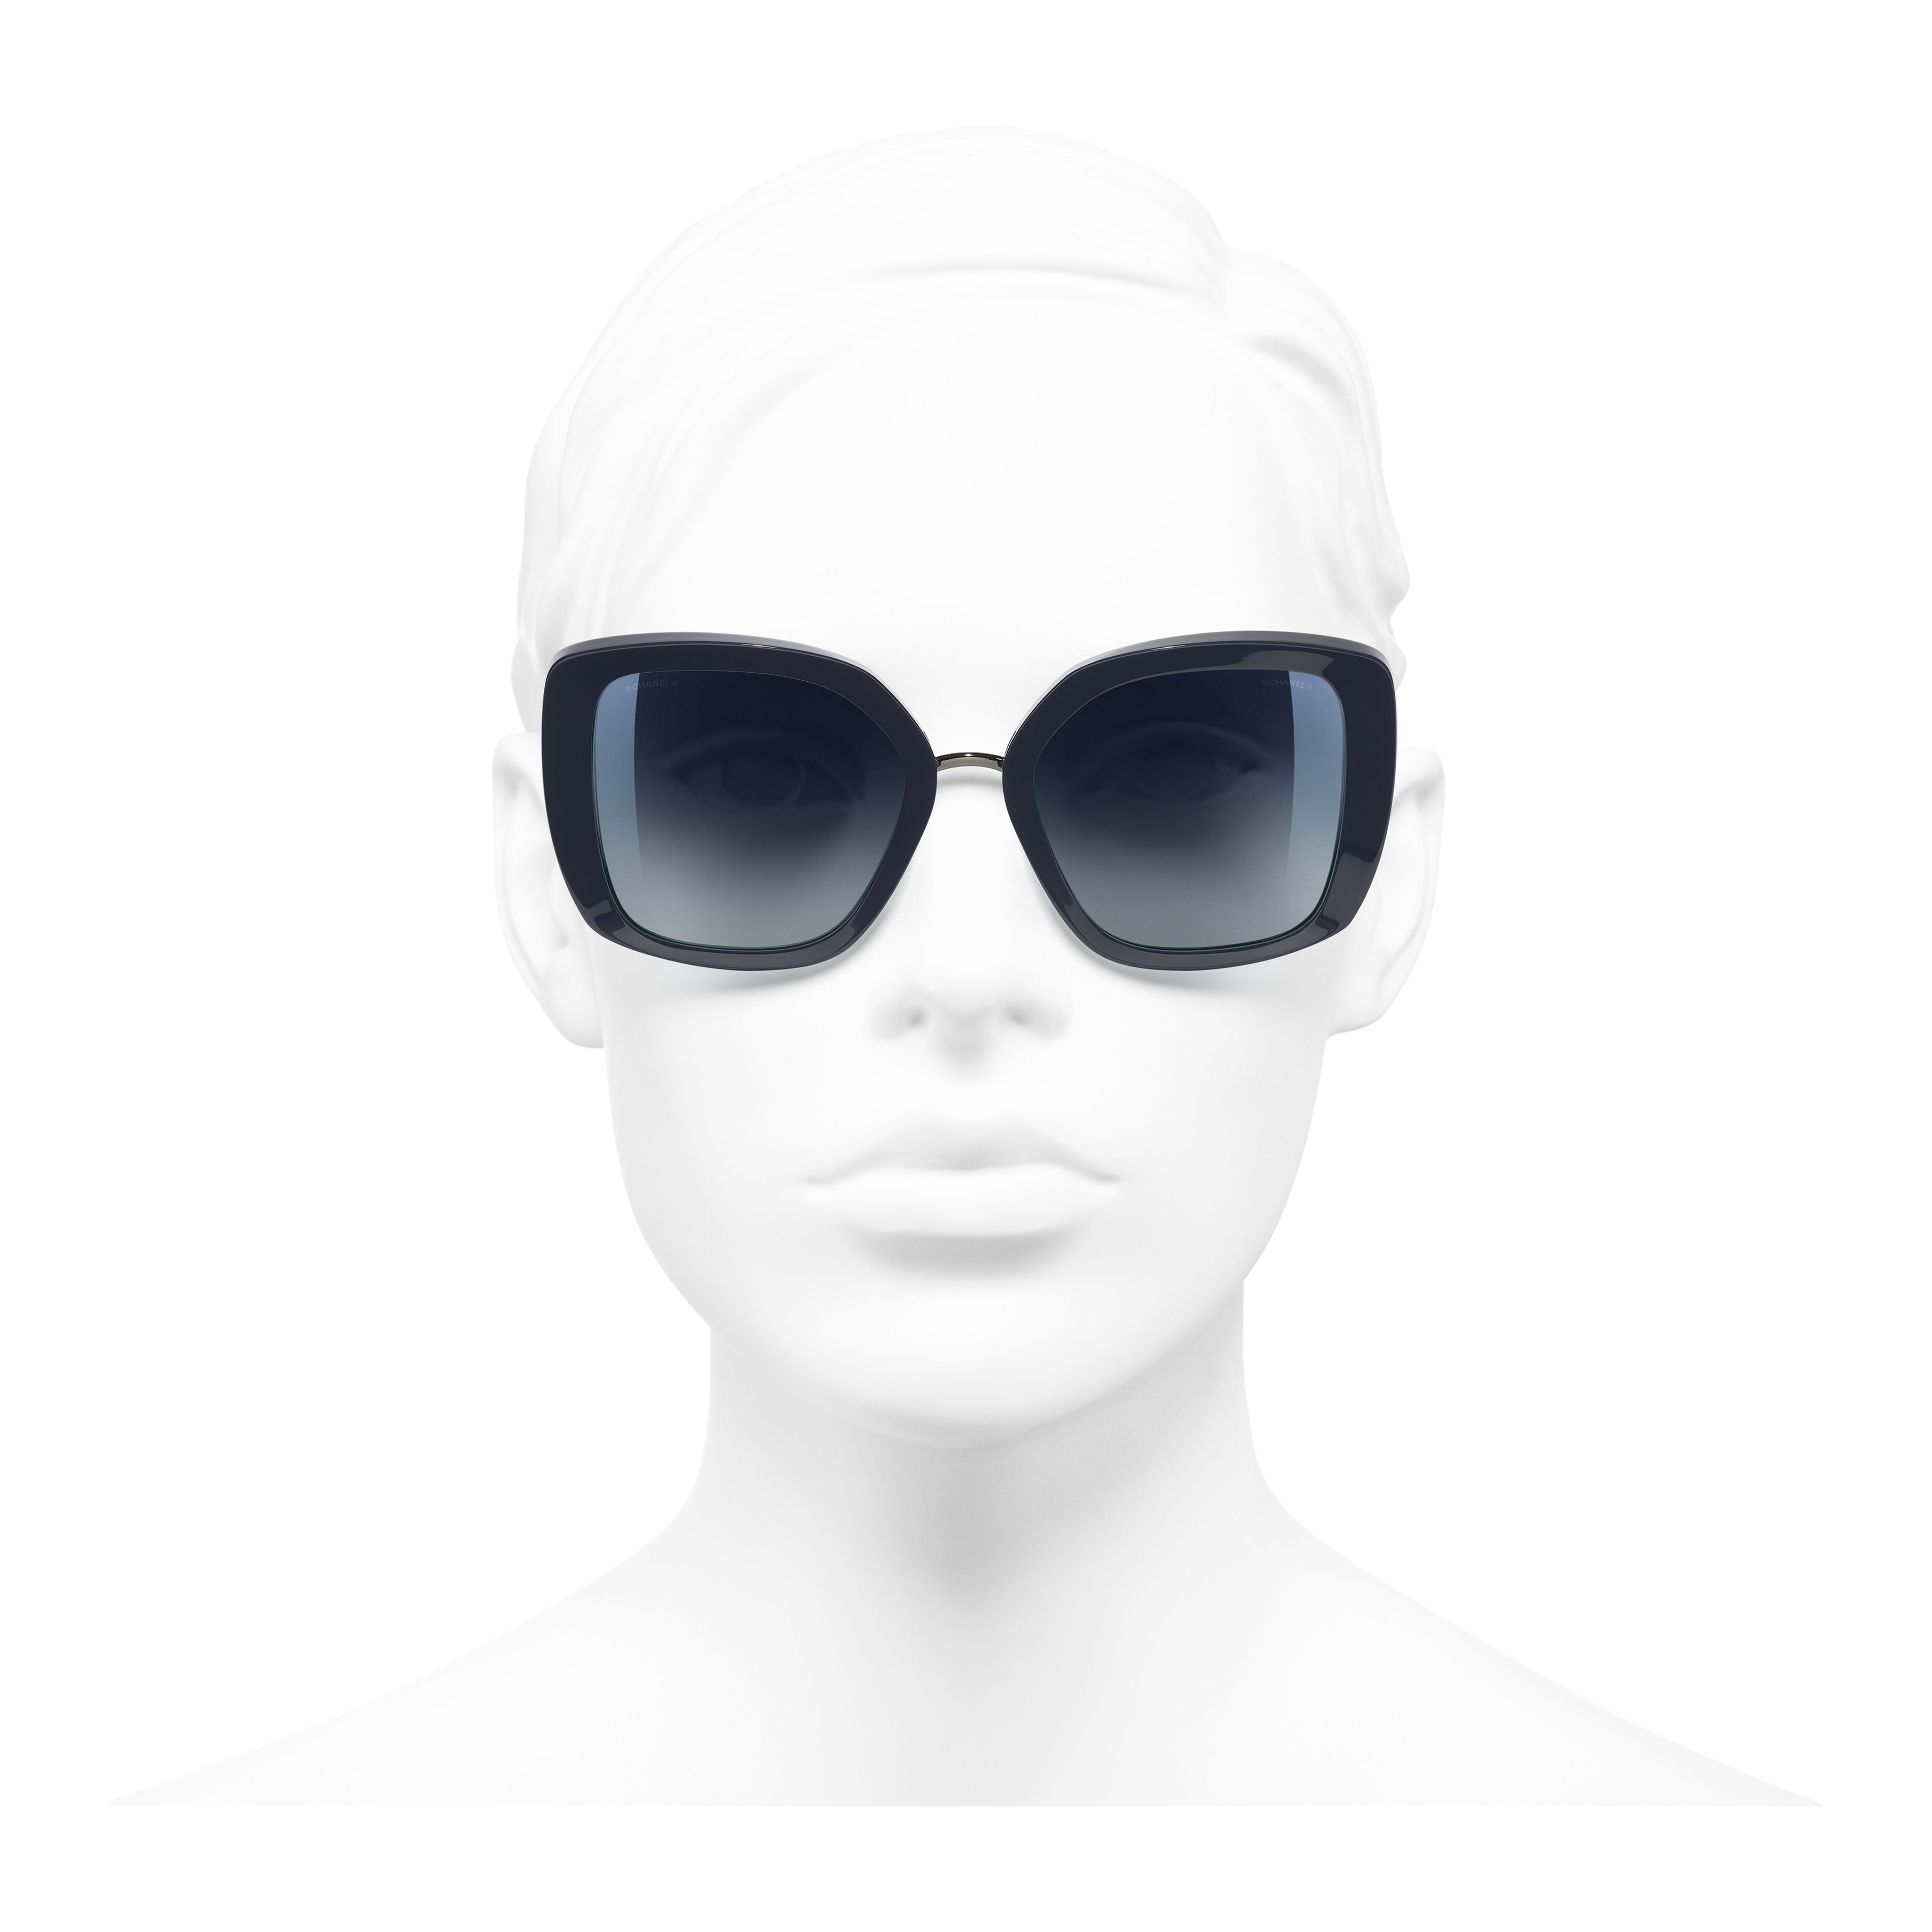 Square Sunglasses Acetate & Metal Dark Blue -                                                                     view 2 - see full sized version